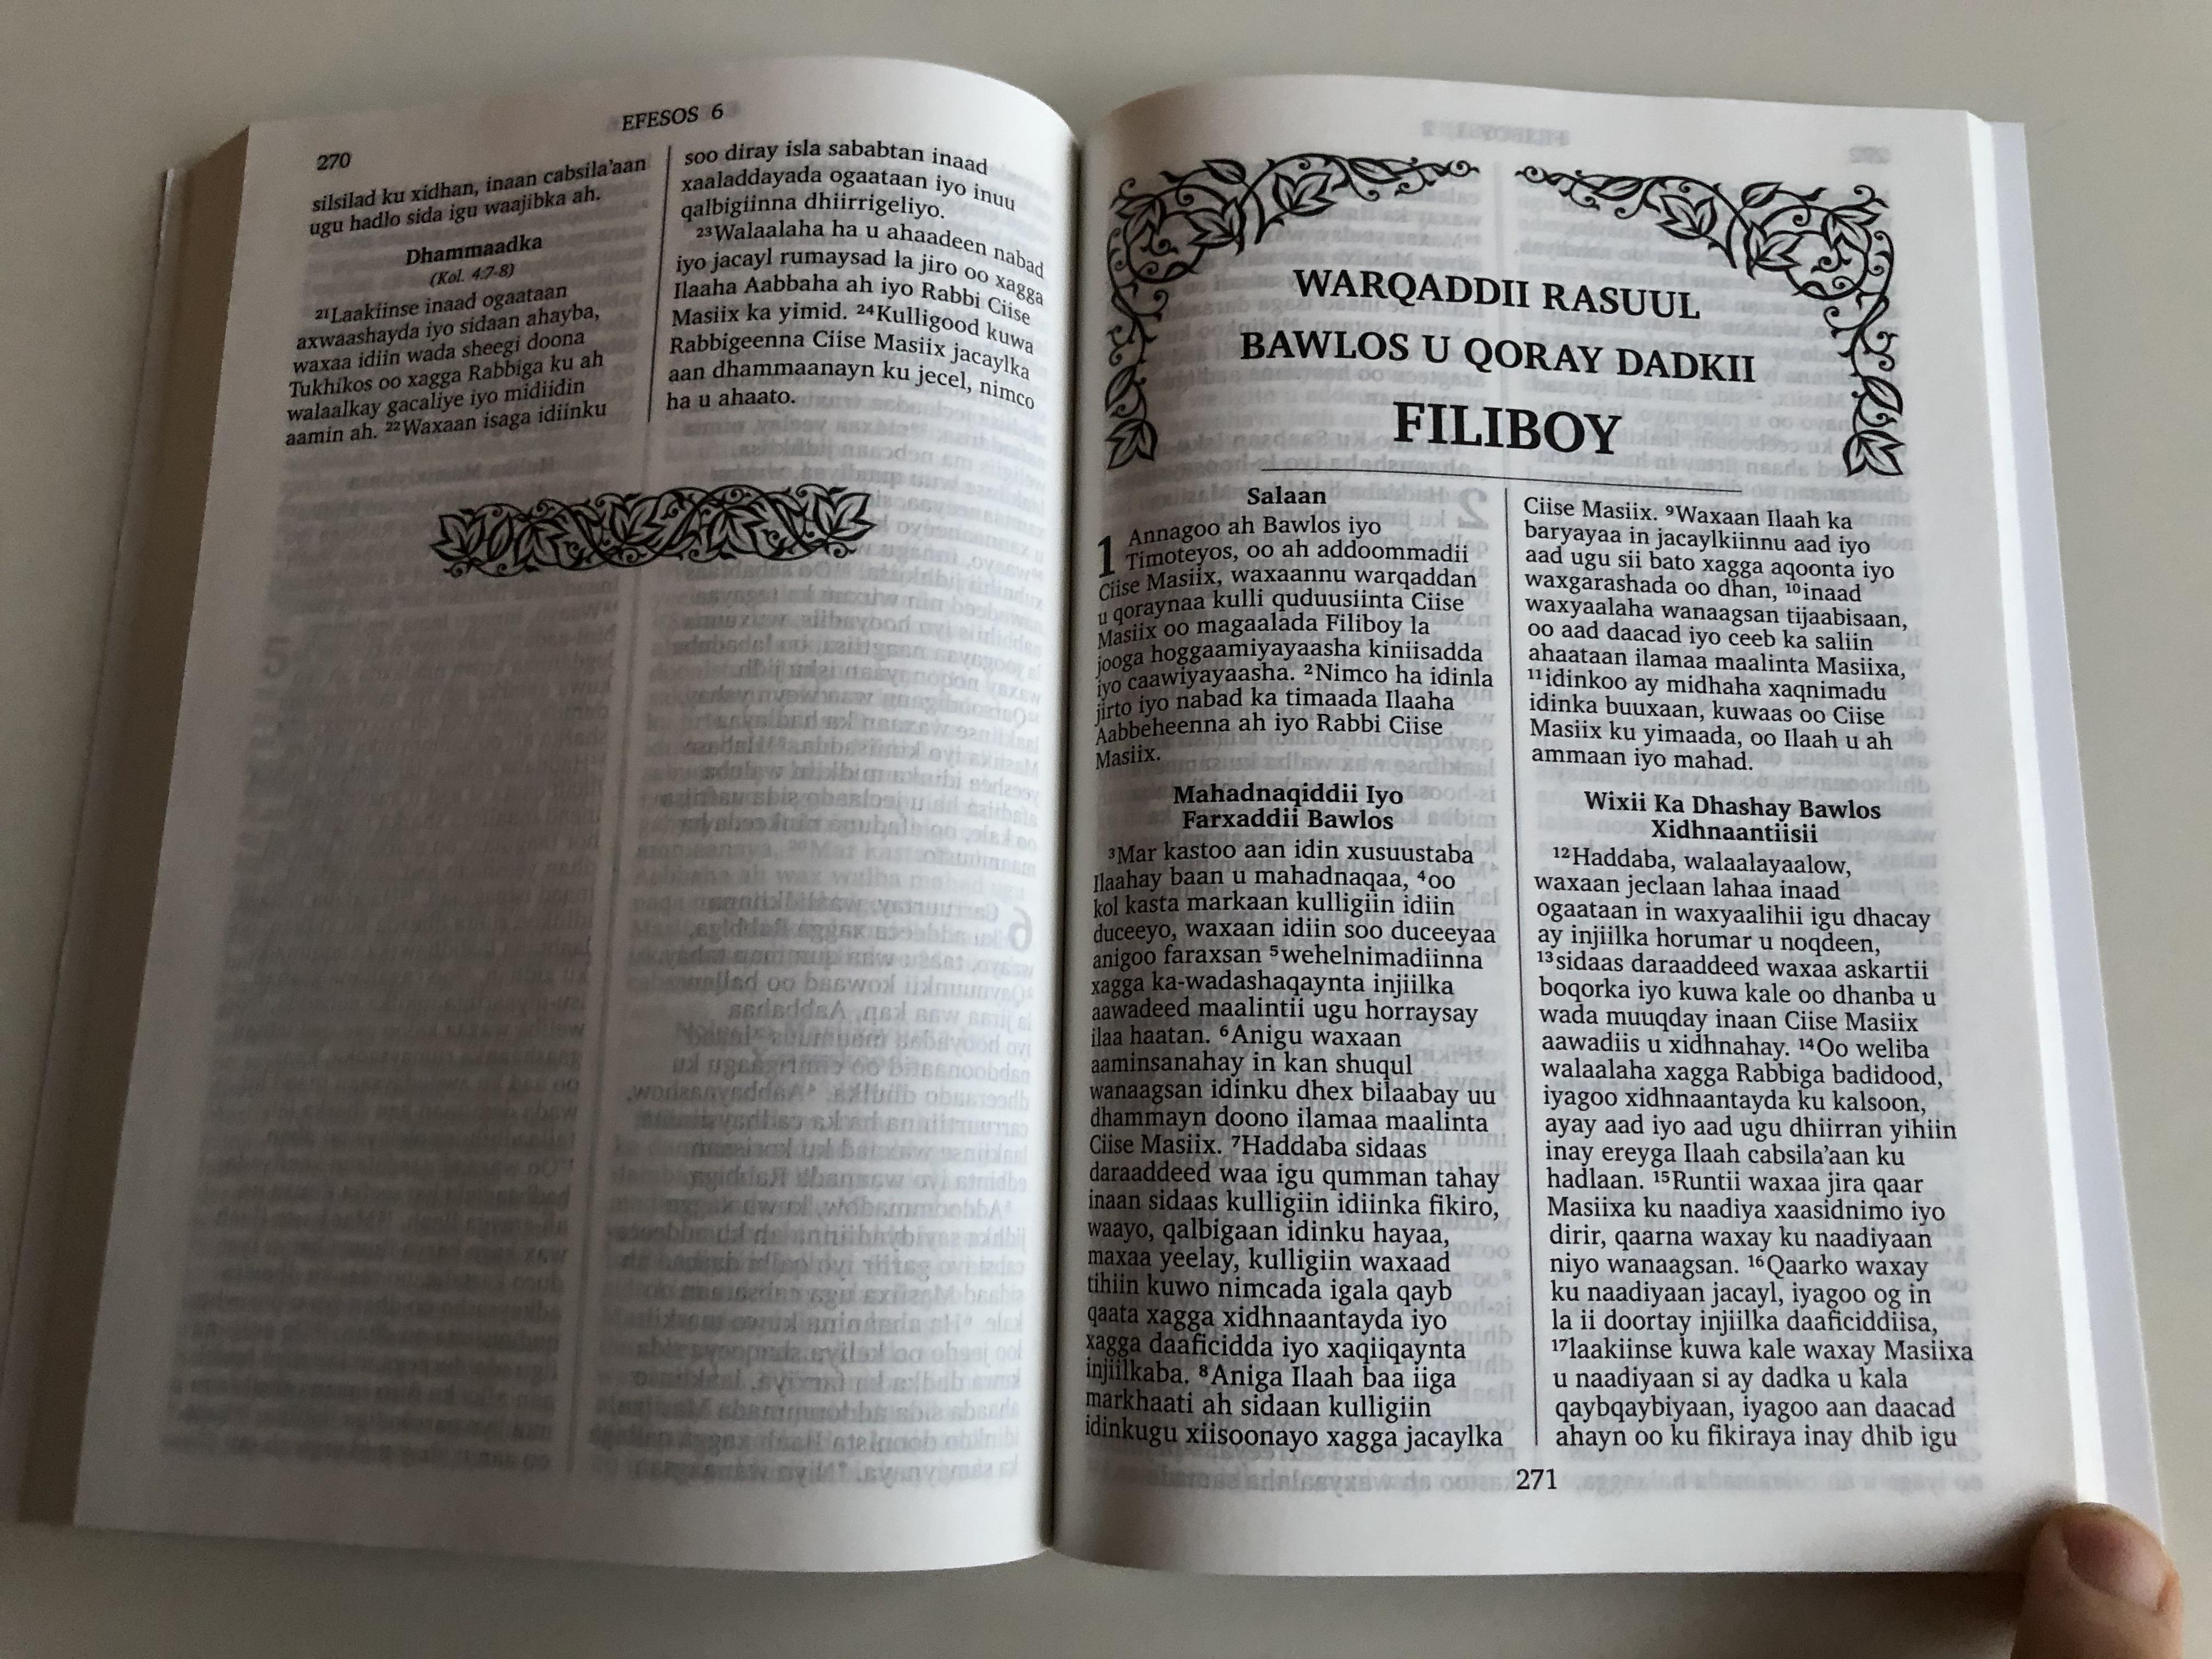 somali-new-testament-kitaabka-quduuska-ah-12.jpg